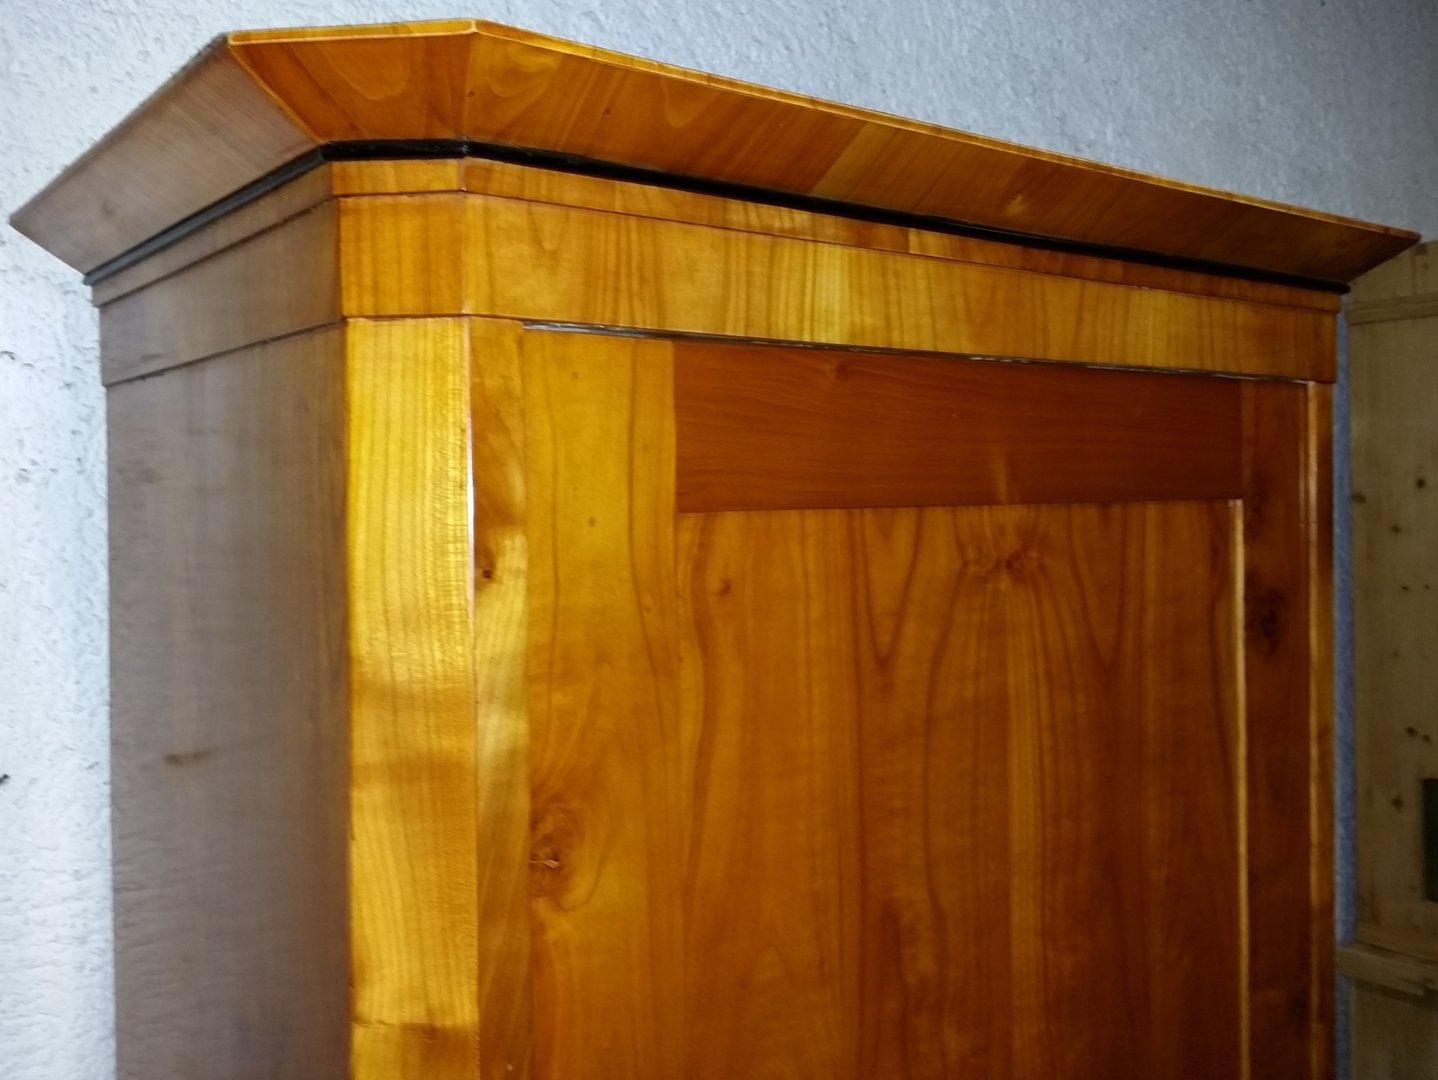 kleiner eint riger biedermeier kirschholzschrank um 1840 antik m bel antiquit ten alling bei. Black Bedroom Furniture Sets. Home Design Ideas